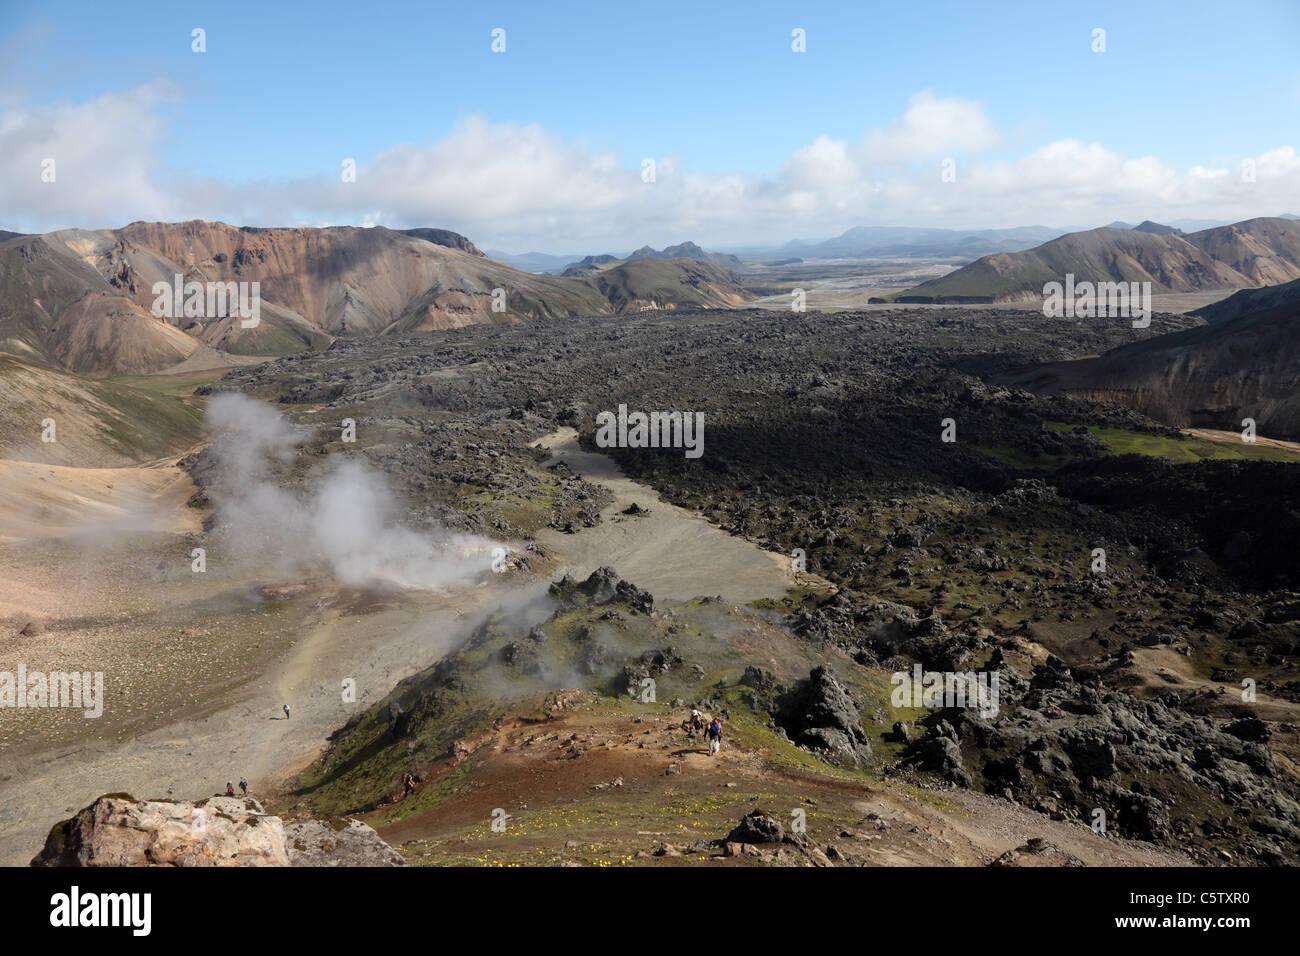 Old Lava Flow with Steam Rising from Fumeroles on the Laugavegur Hiking Trail Near Landmannalaugar Fjallabak Area - Stock Image